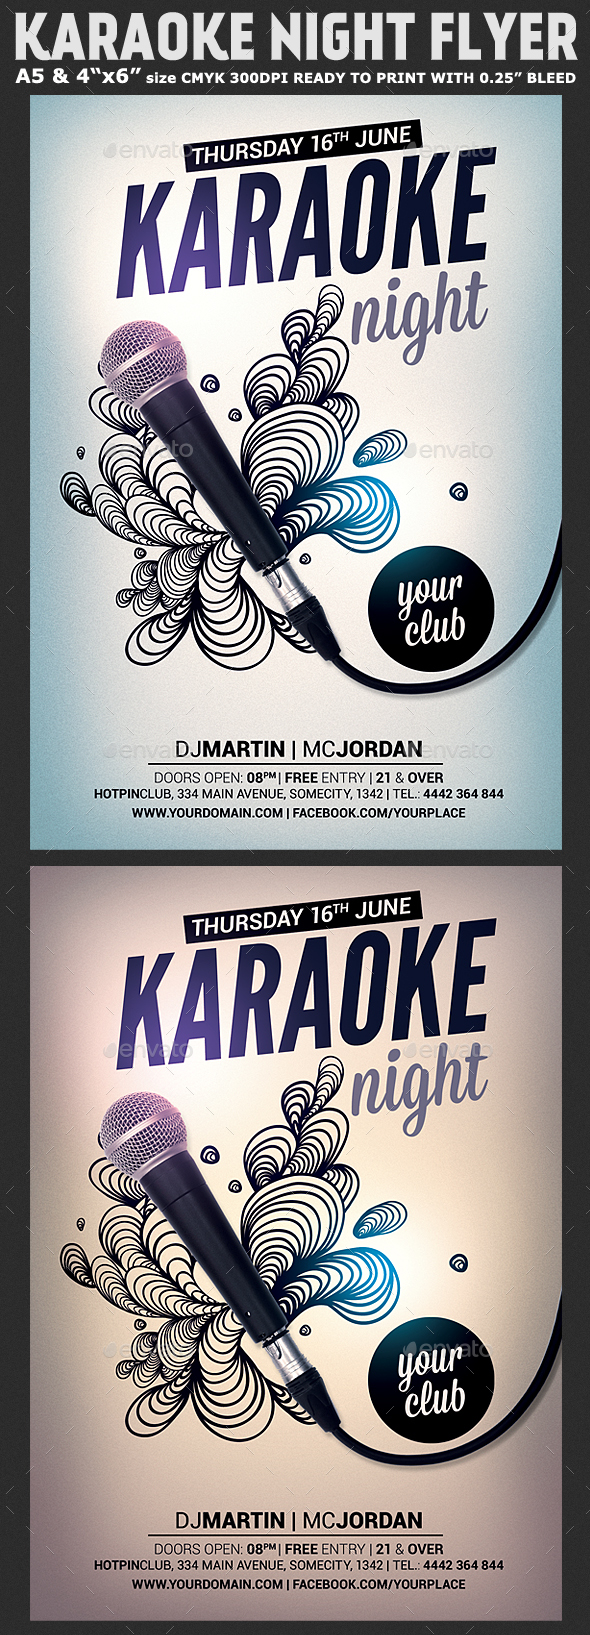 Karaoke Night Flyer Template - Clubs & Parties Events